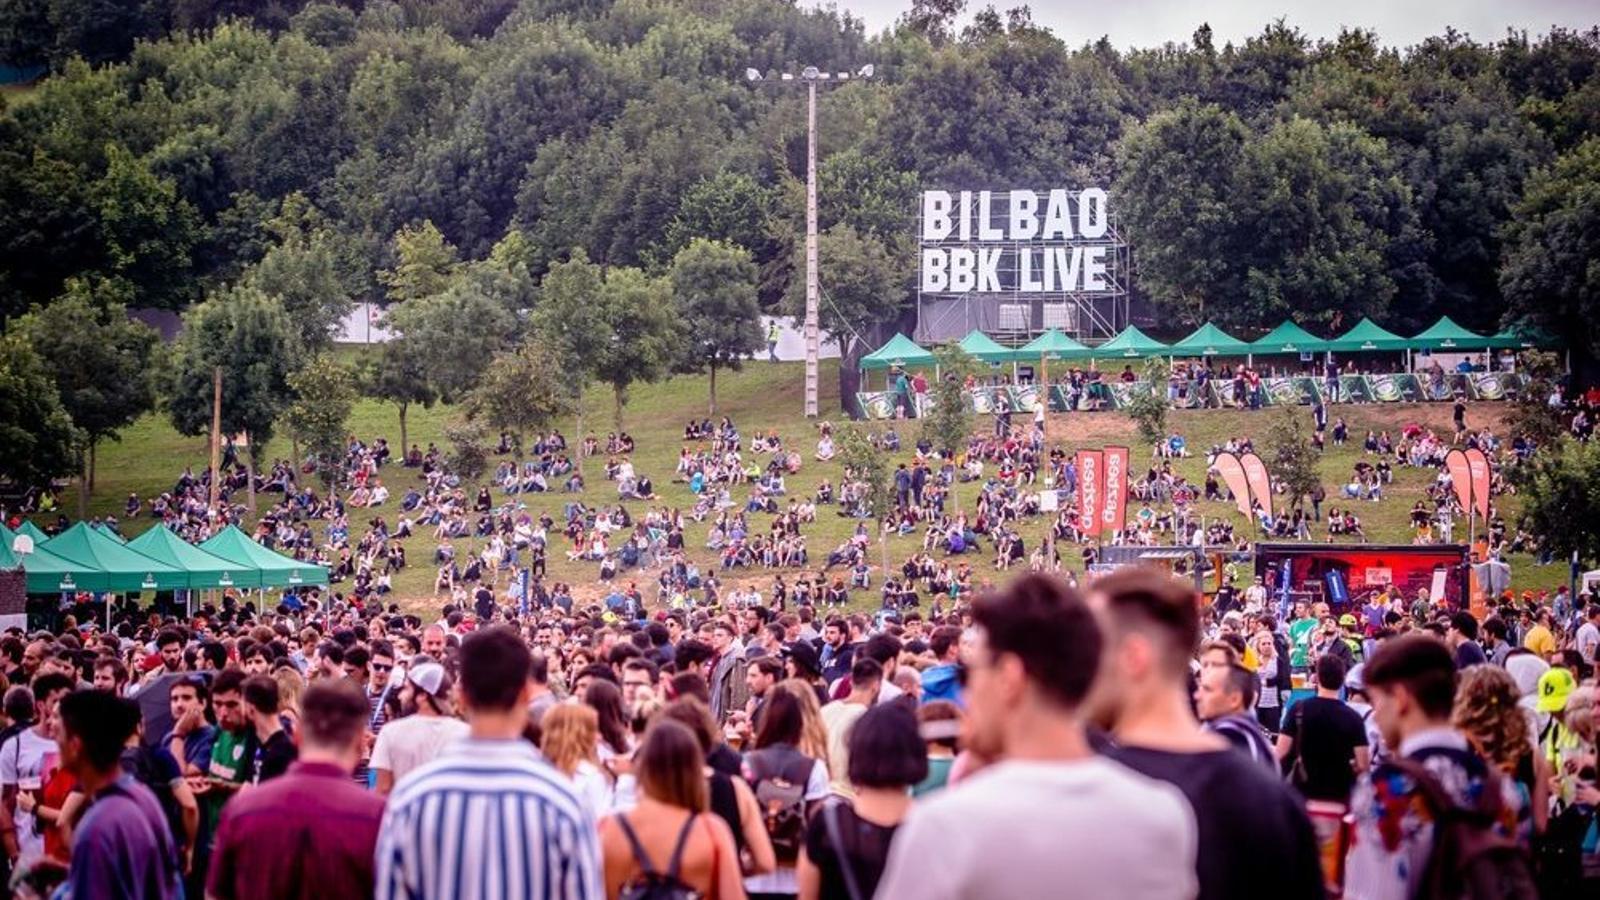 Festival Bilbao BBK Live.